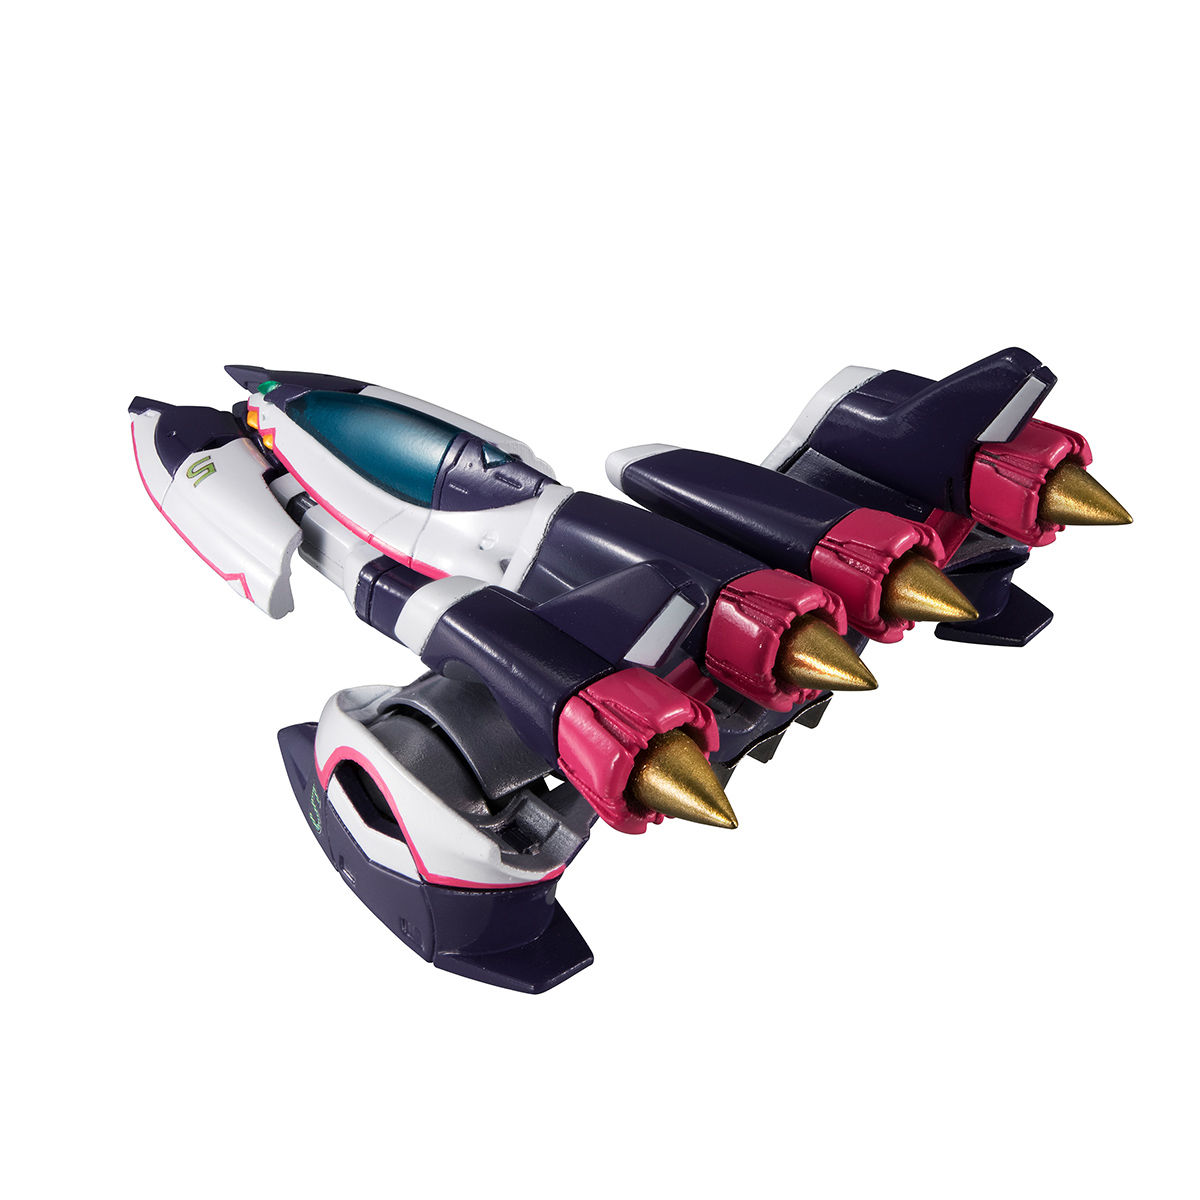 C.F.C.『凰呀AN-21 モードチェンジ セットB(エアロモード&スーパーエアロブーストモード)』新世紀GPXサイバーフォーミュラSIN 完成品モデル-009